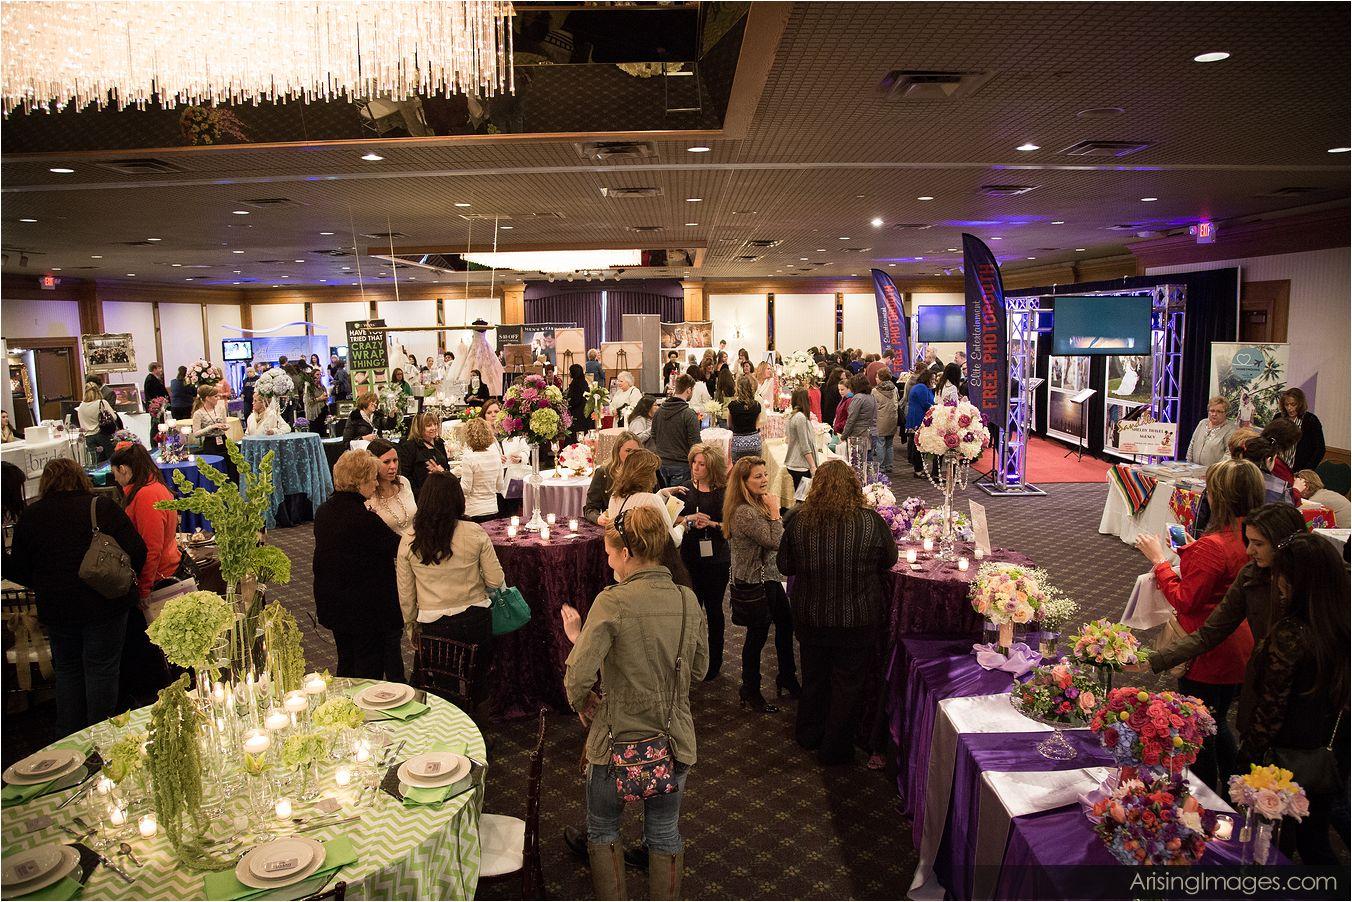 Award Winning Viviano Flower Shop Hosts Popular 27th Annual Bridal Show